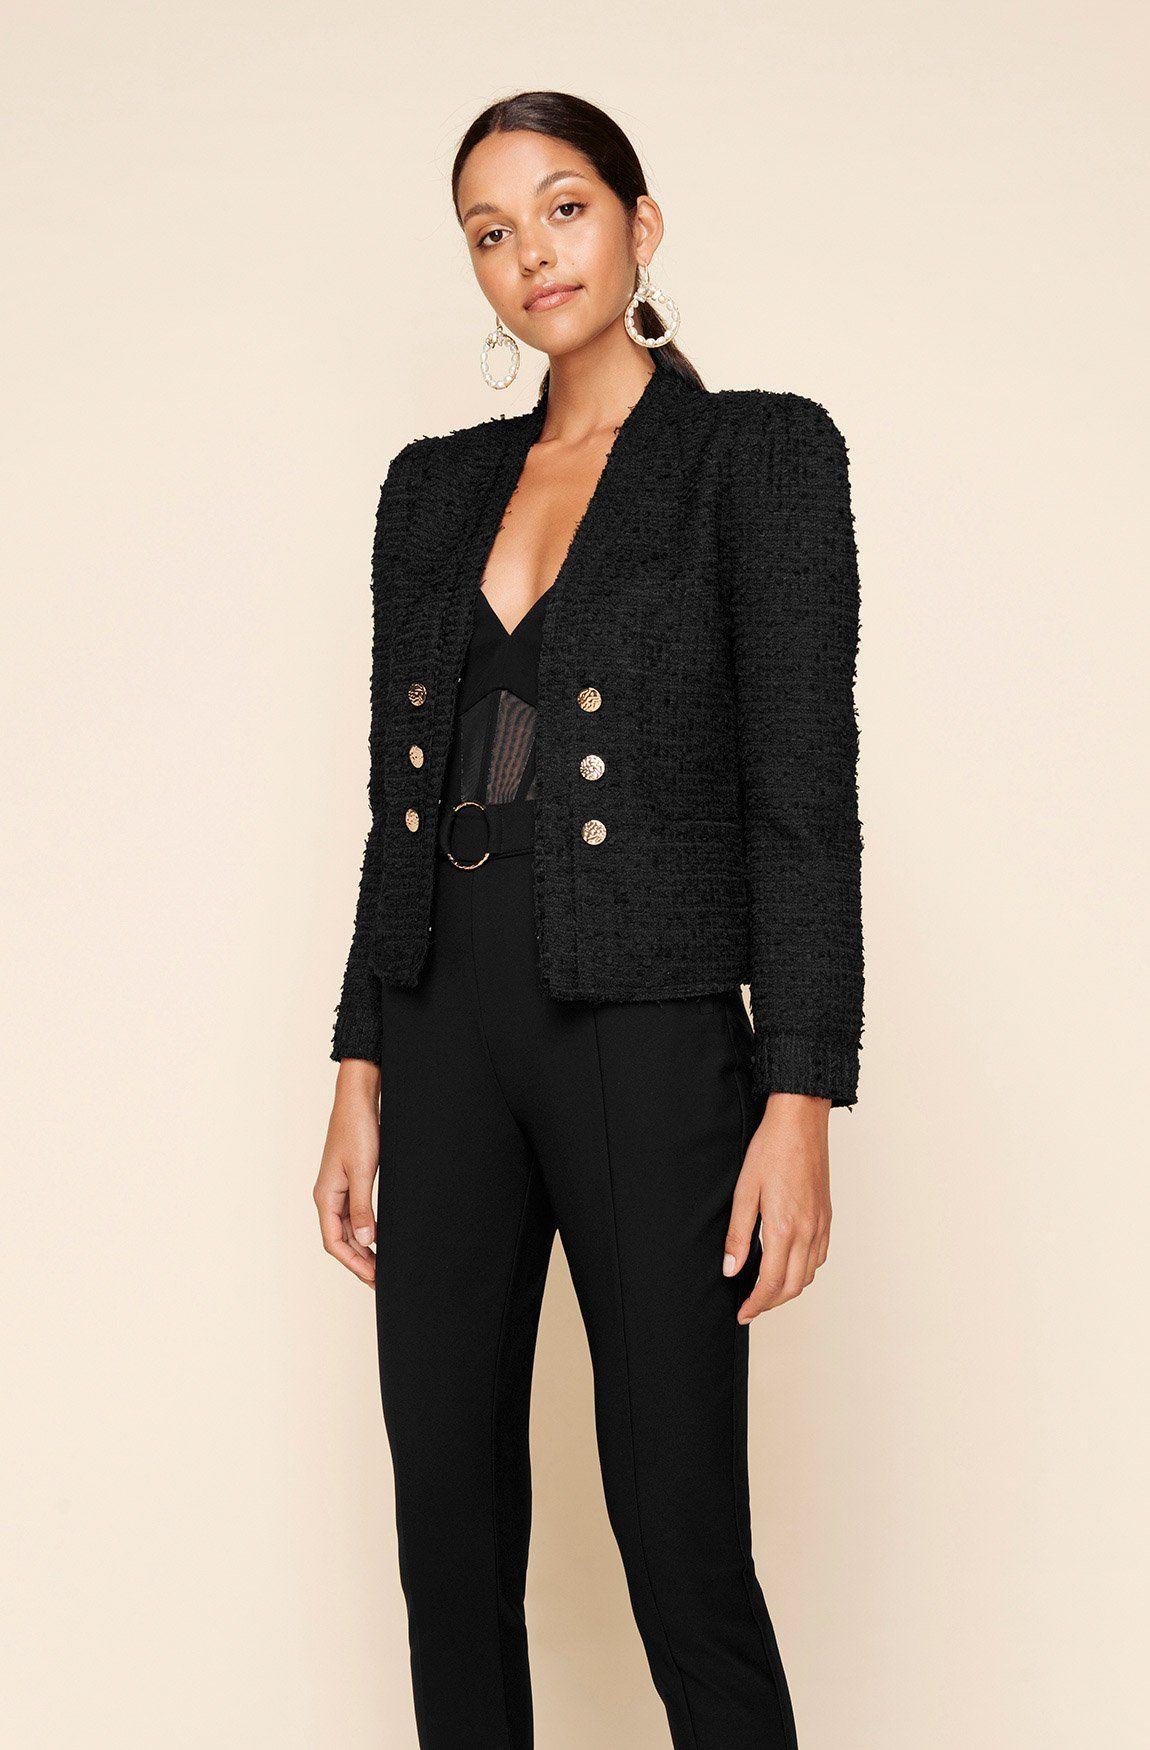 Black Catalina Jacket Jackets Coats Sheike Shop Online Jackets Tweed Jacket Clothes [ 1750 x 1150 Pixel ]